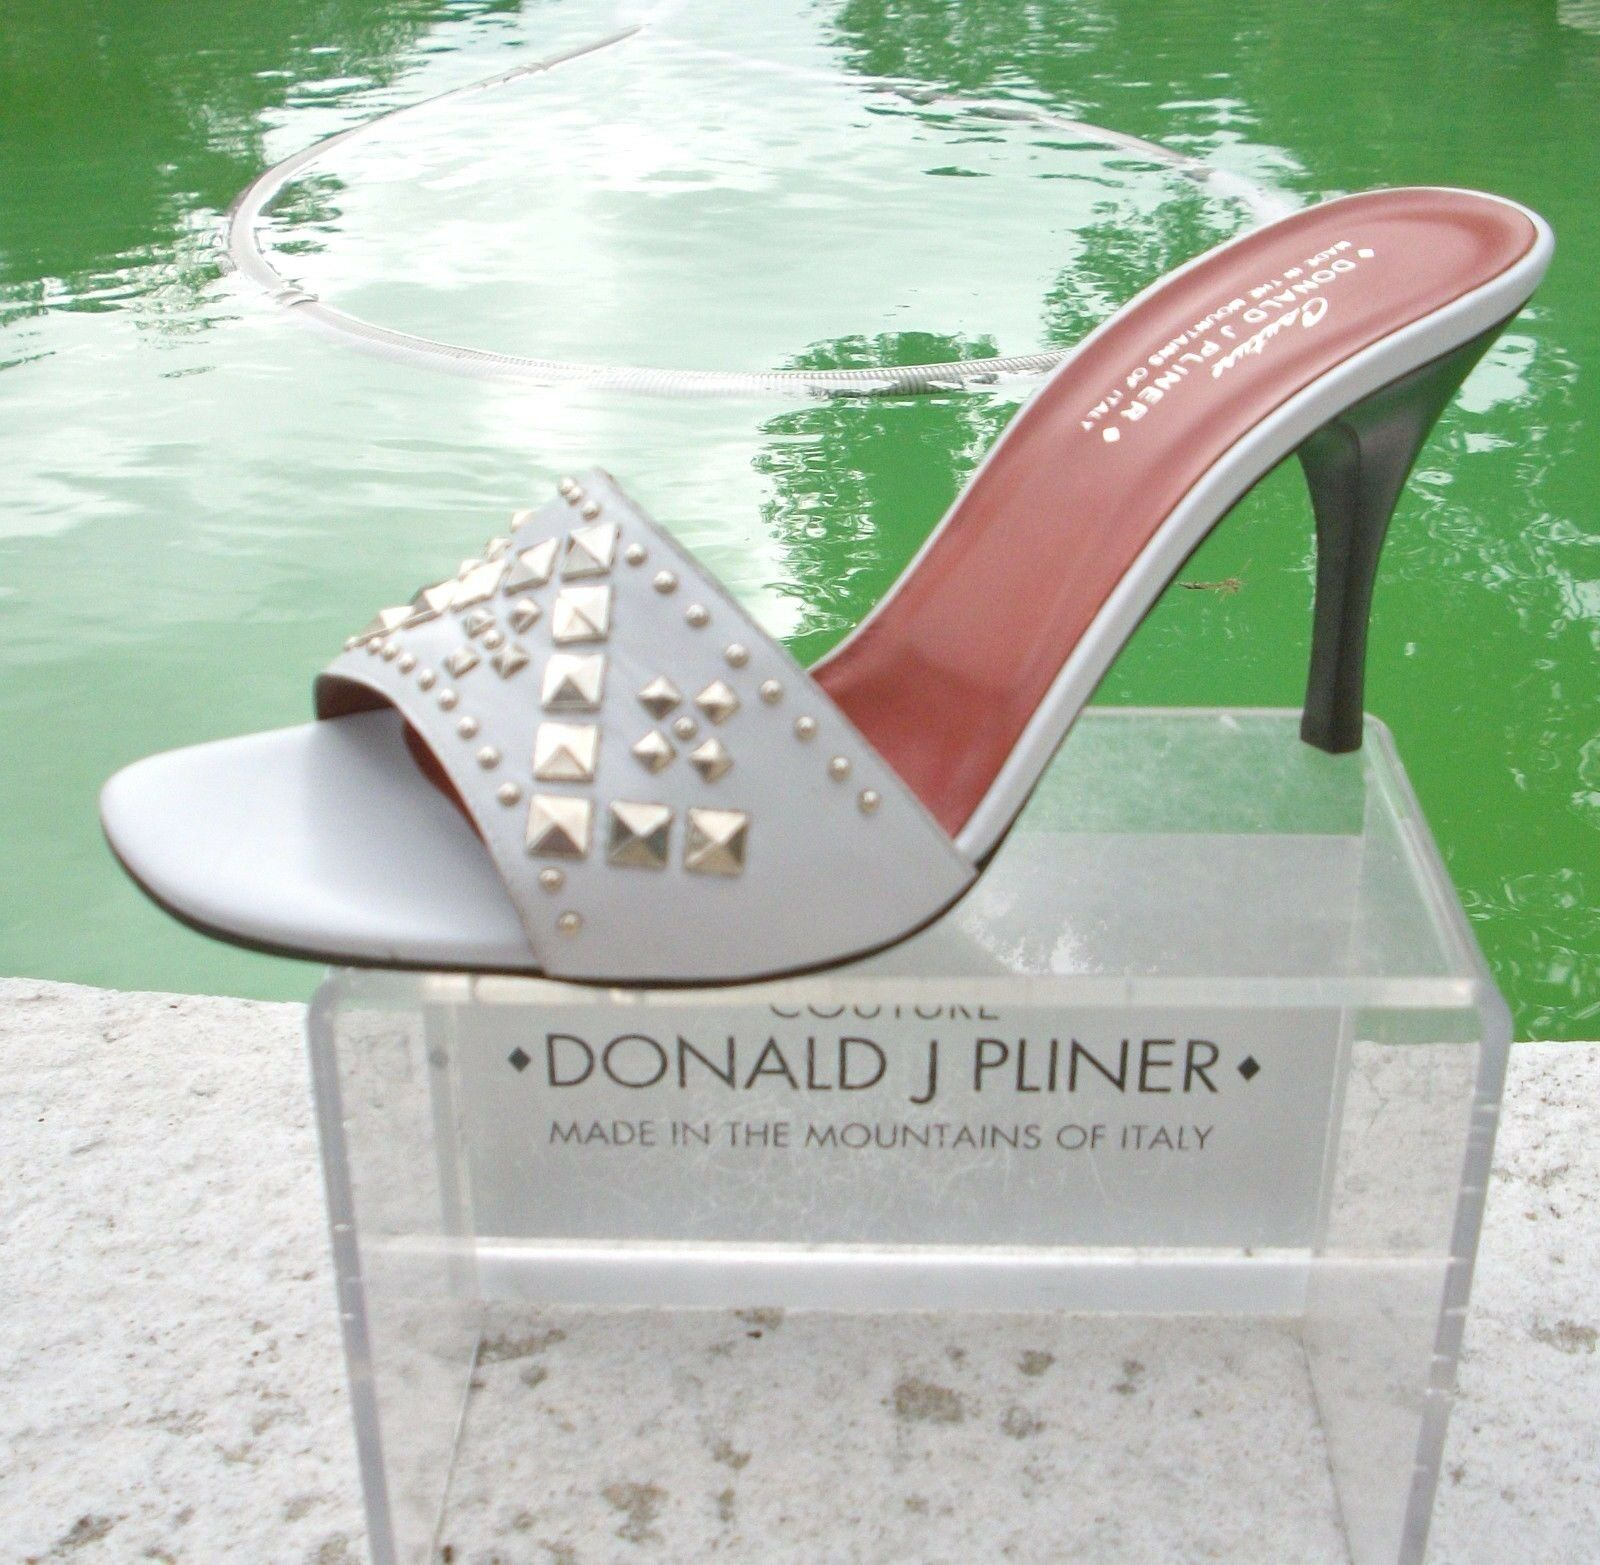 Donald Pliner Couture Baby Blau Calf Leder Schuhe New New New Metal Stud 235 NIB Größe 6 8e3de2